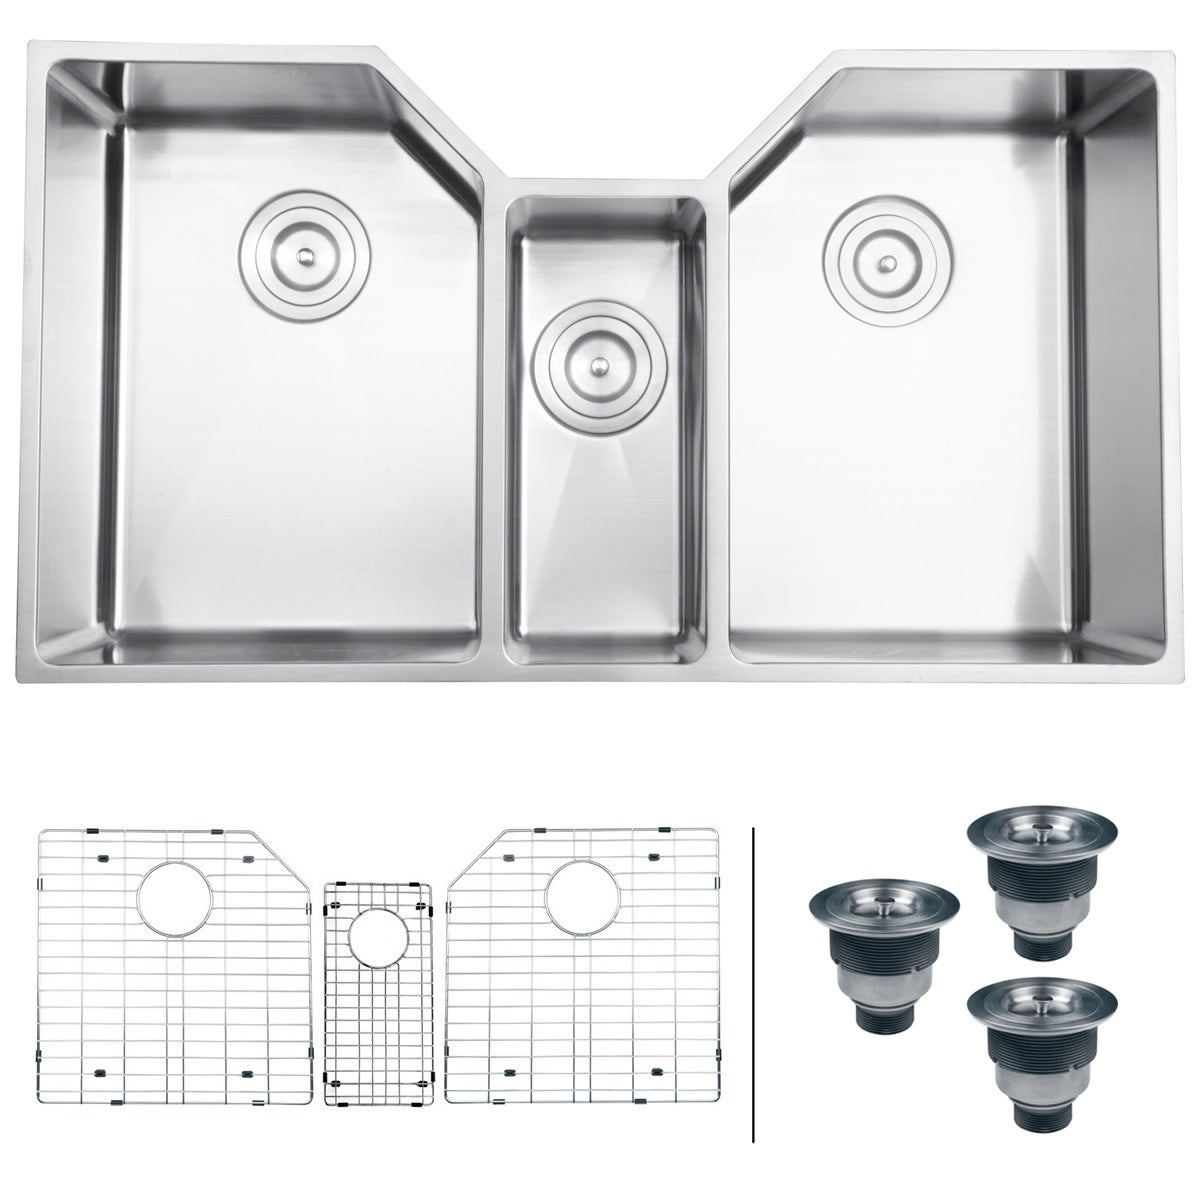 Ruvati Rvh8500 Gravena 35 Undermount Triple Basin 16 Gauge Stainless Steel Kitchen Sink With 3 Racks Basket Strainers